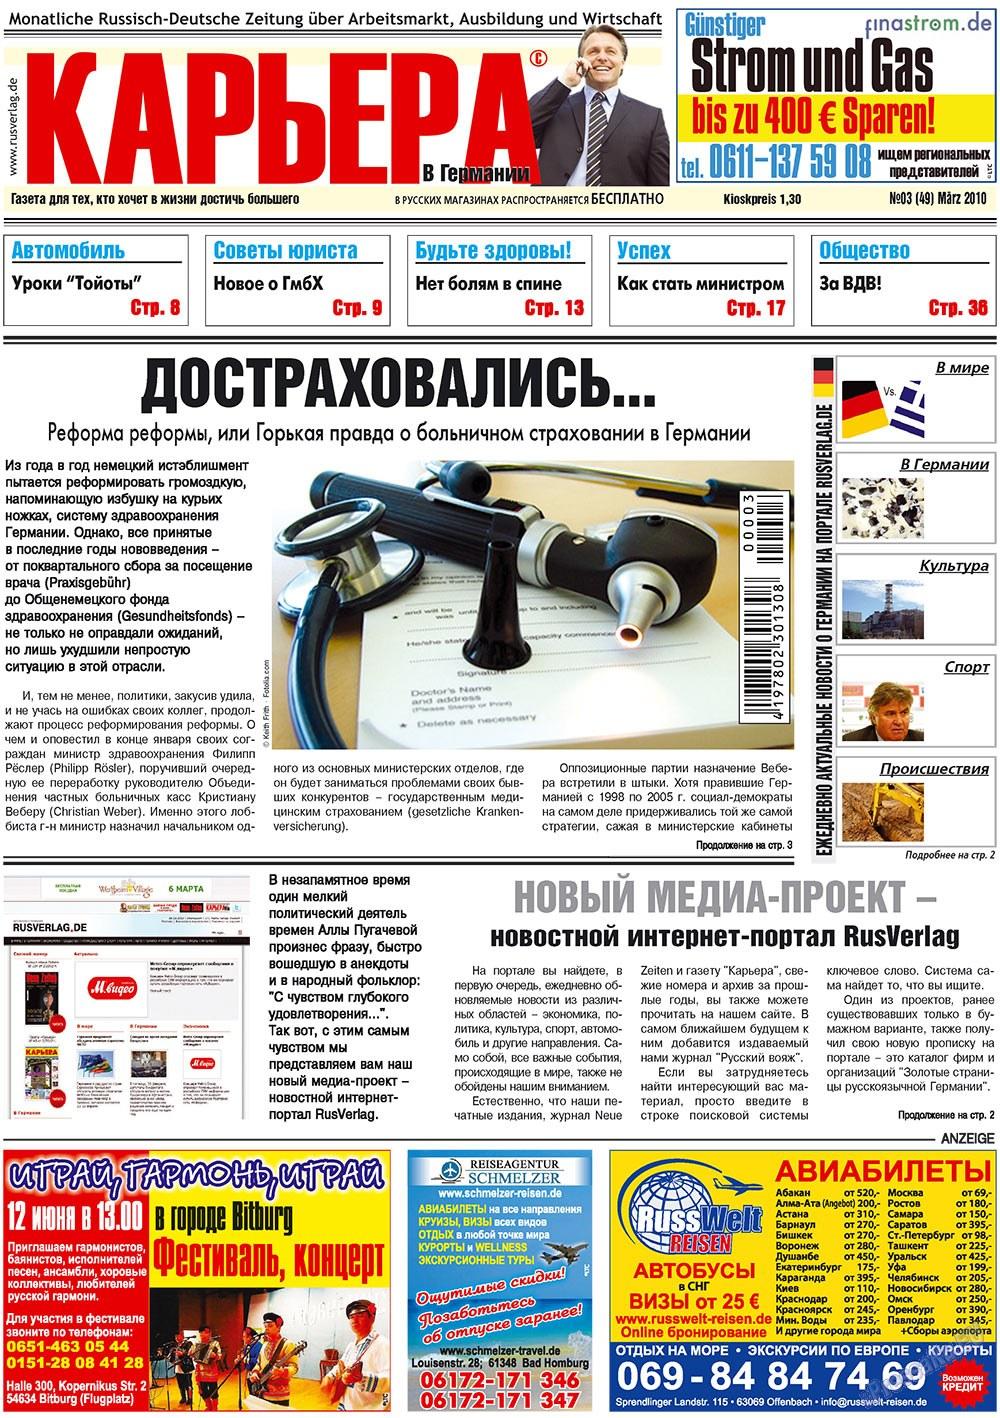 Карьера (газета). 2010 год, номер 3, стр. 1